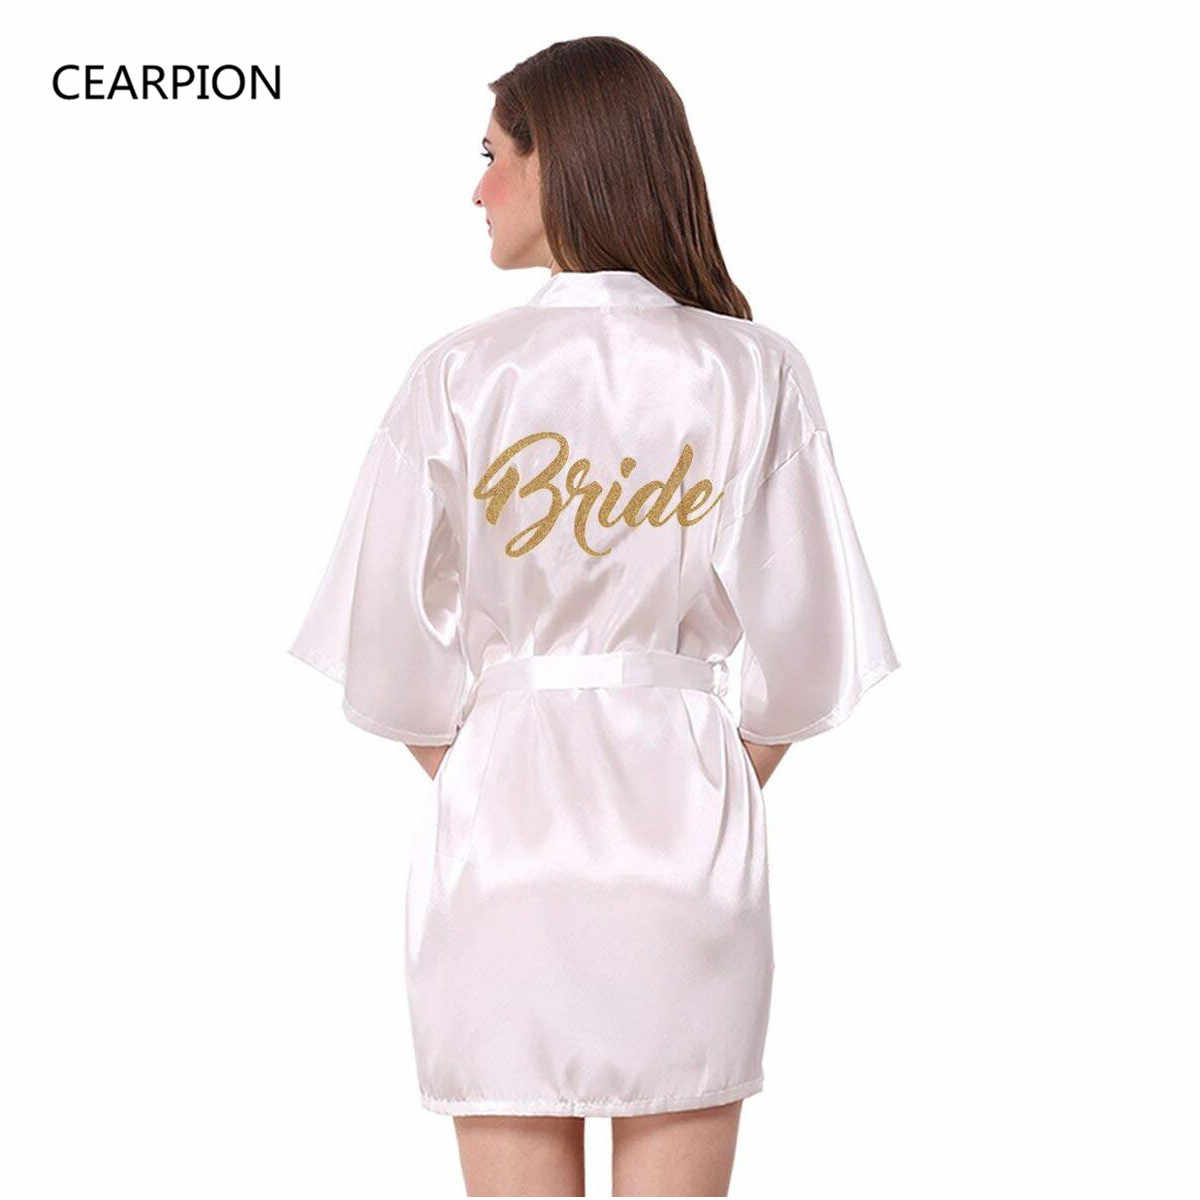 CEARPION Bride Robe Satin Sexy V-Neck Bride Spa Kimono Bathrobe Gown Bridal  Party Gifts 99fadda58b63